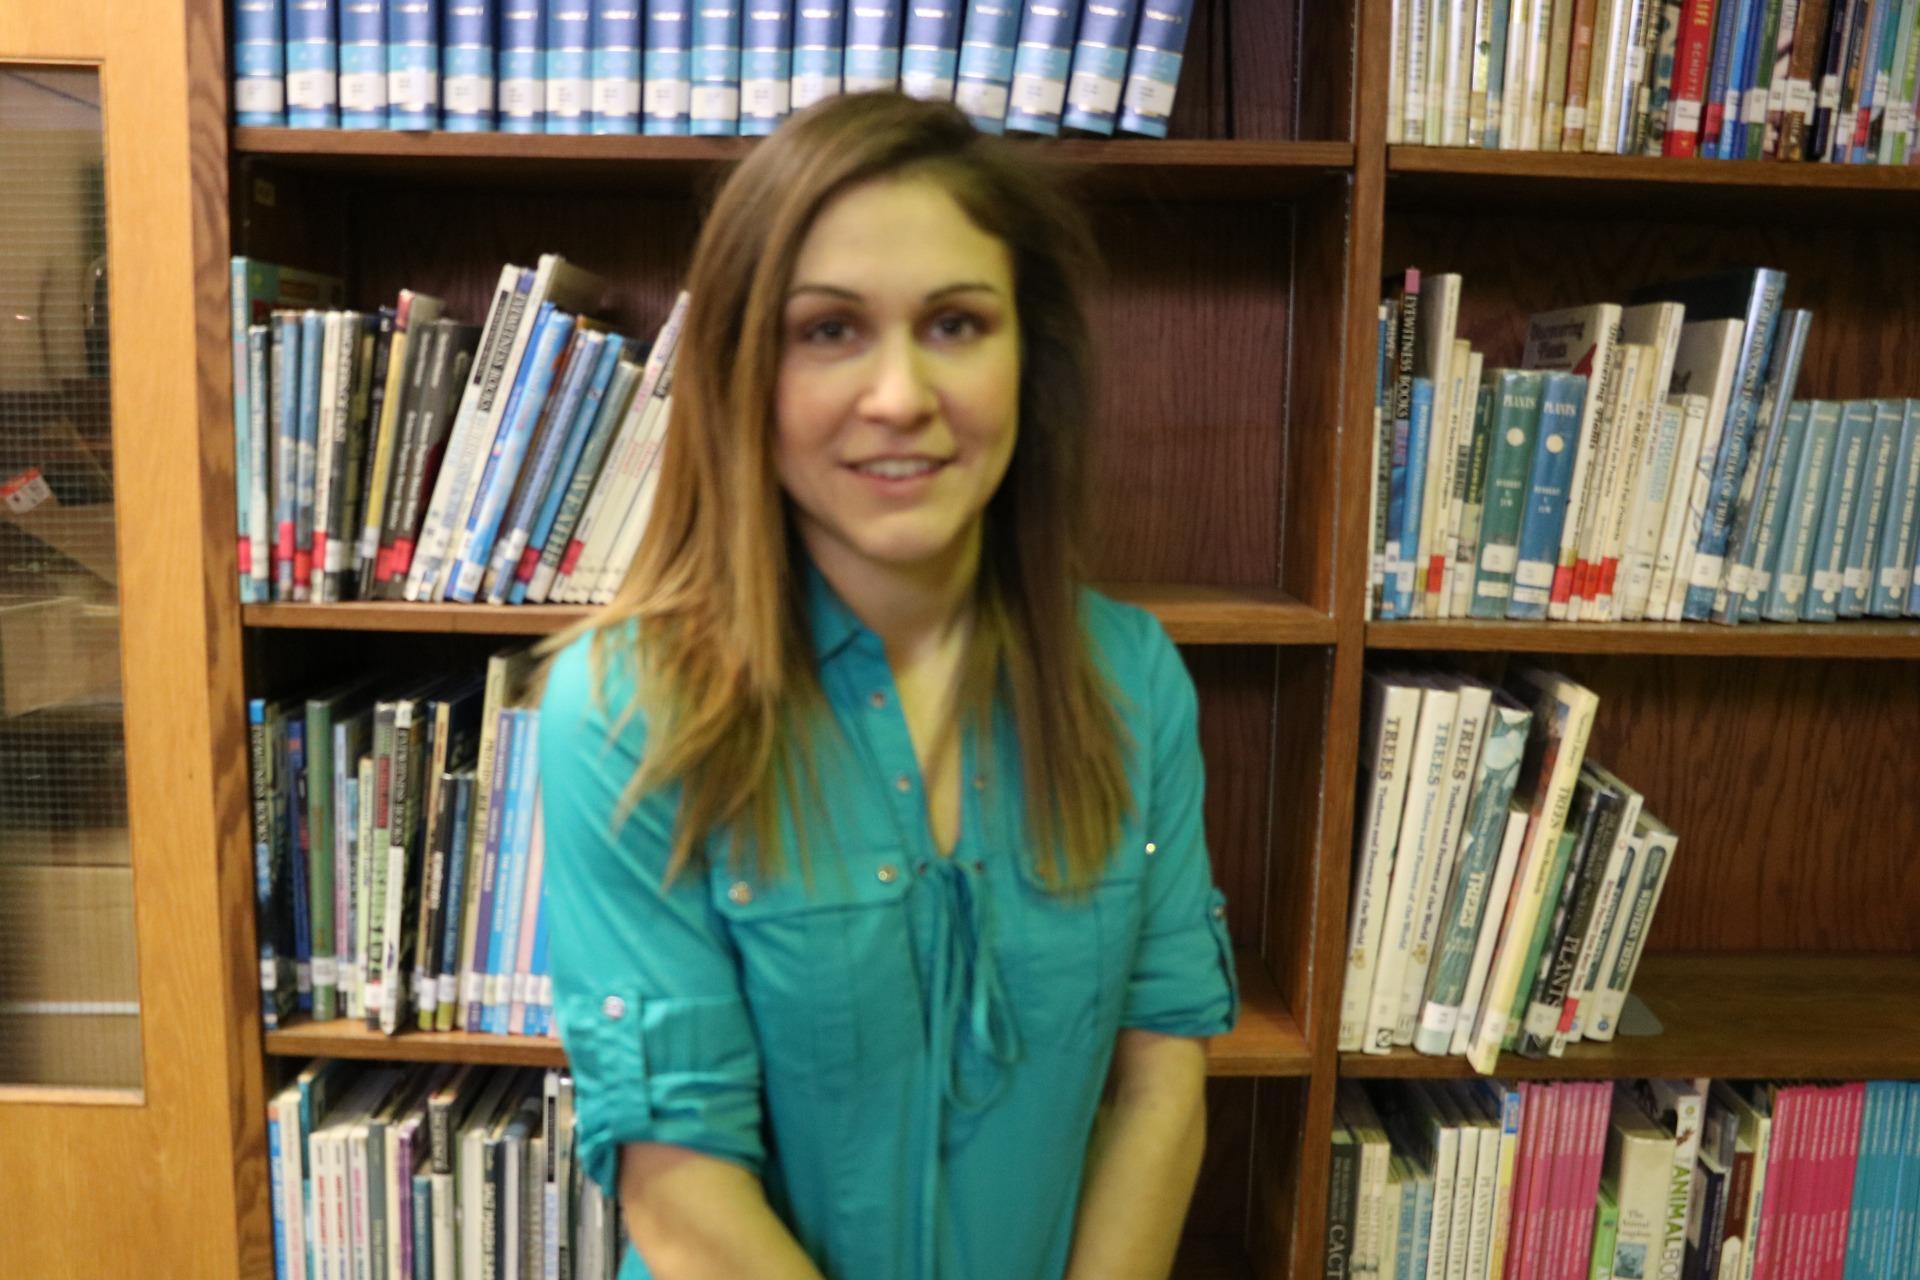 Teacher of the Year Paula Stauhs